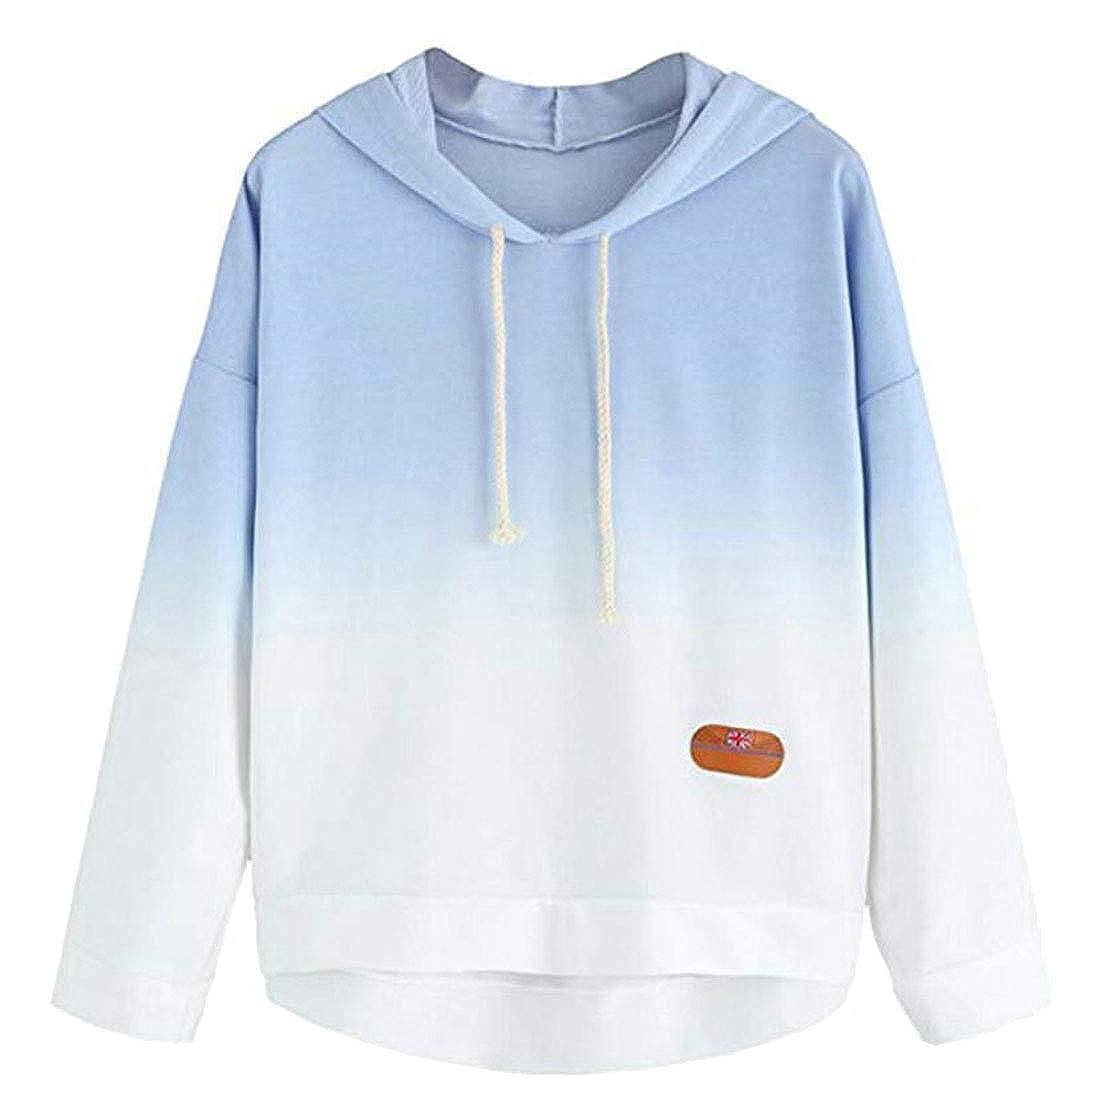 XiaoTianXinWomen XTX Womens Gradient Color Basic Drawstring Hoodie Pullover Sweatshirt